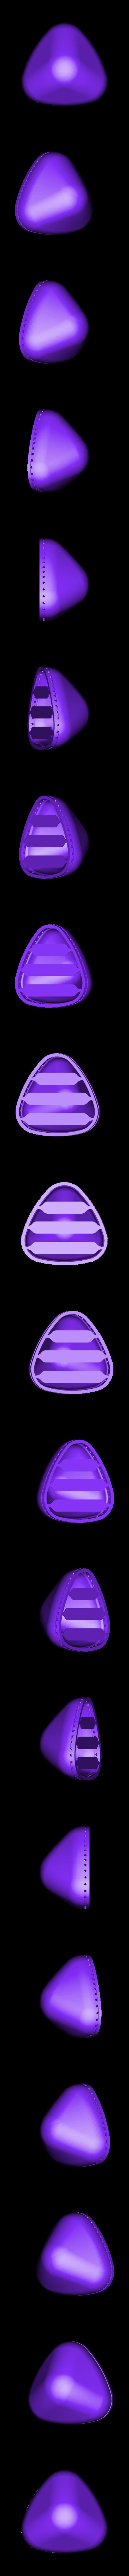 blob.stl Download free STL file Blob - zipper pouch • 3D printable template, Yazhgar